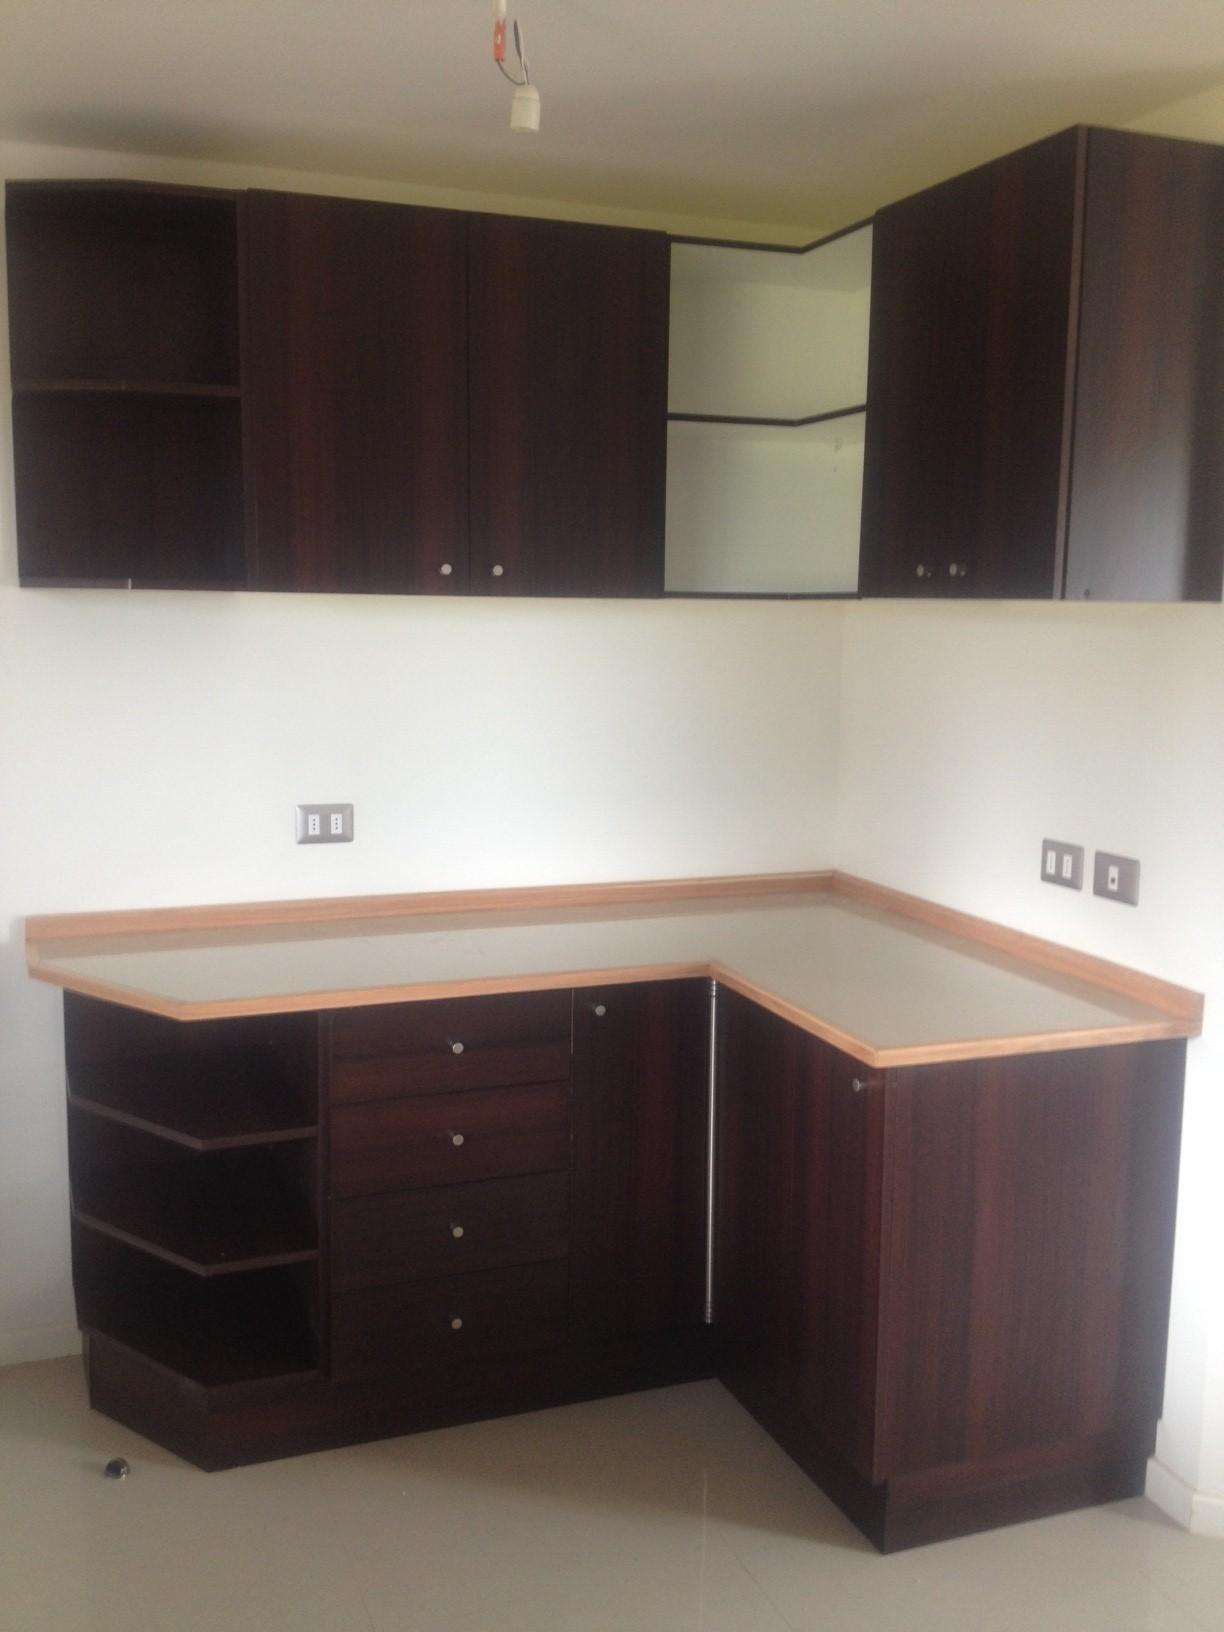 L nea hogar muebles de cocina ebano muebles muebles for Muebles de cocina para montar